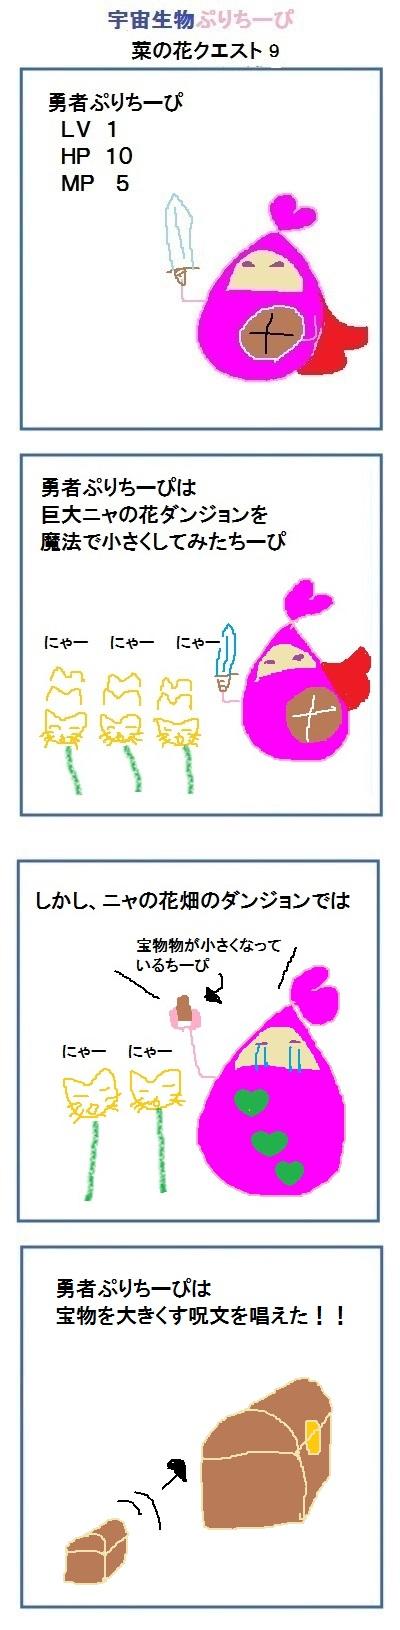 201603220036393e0.jpg